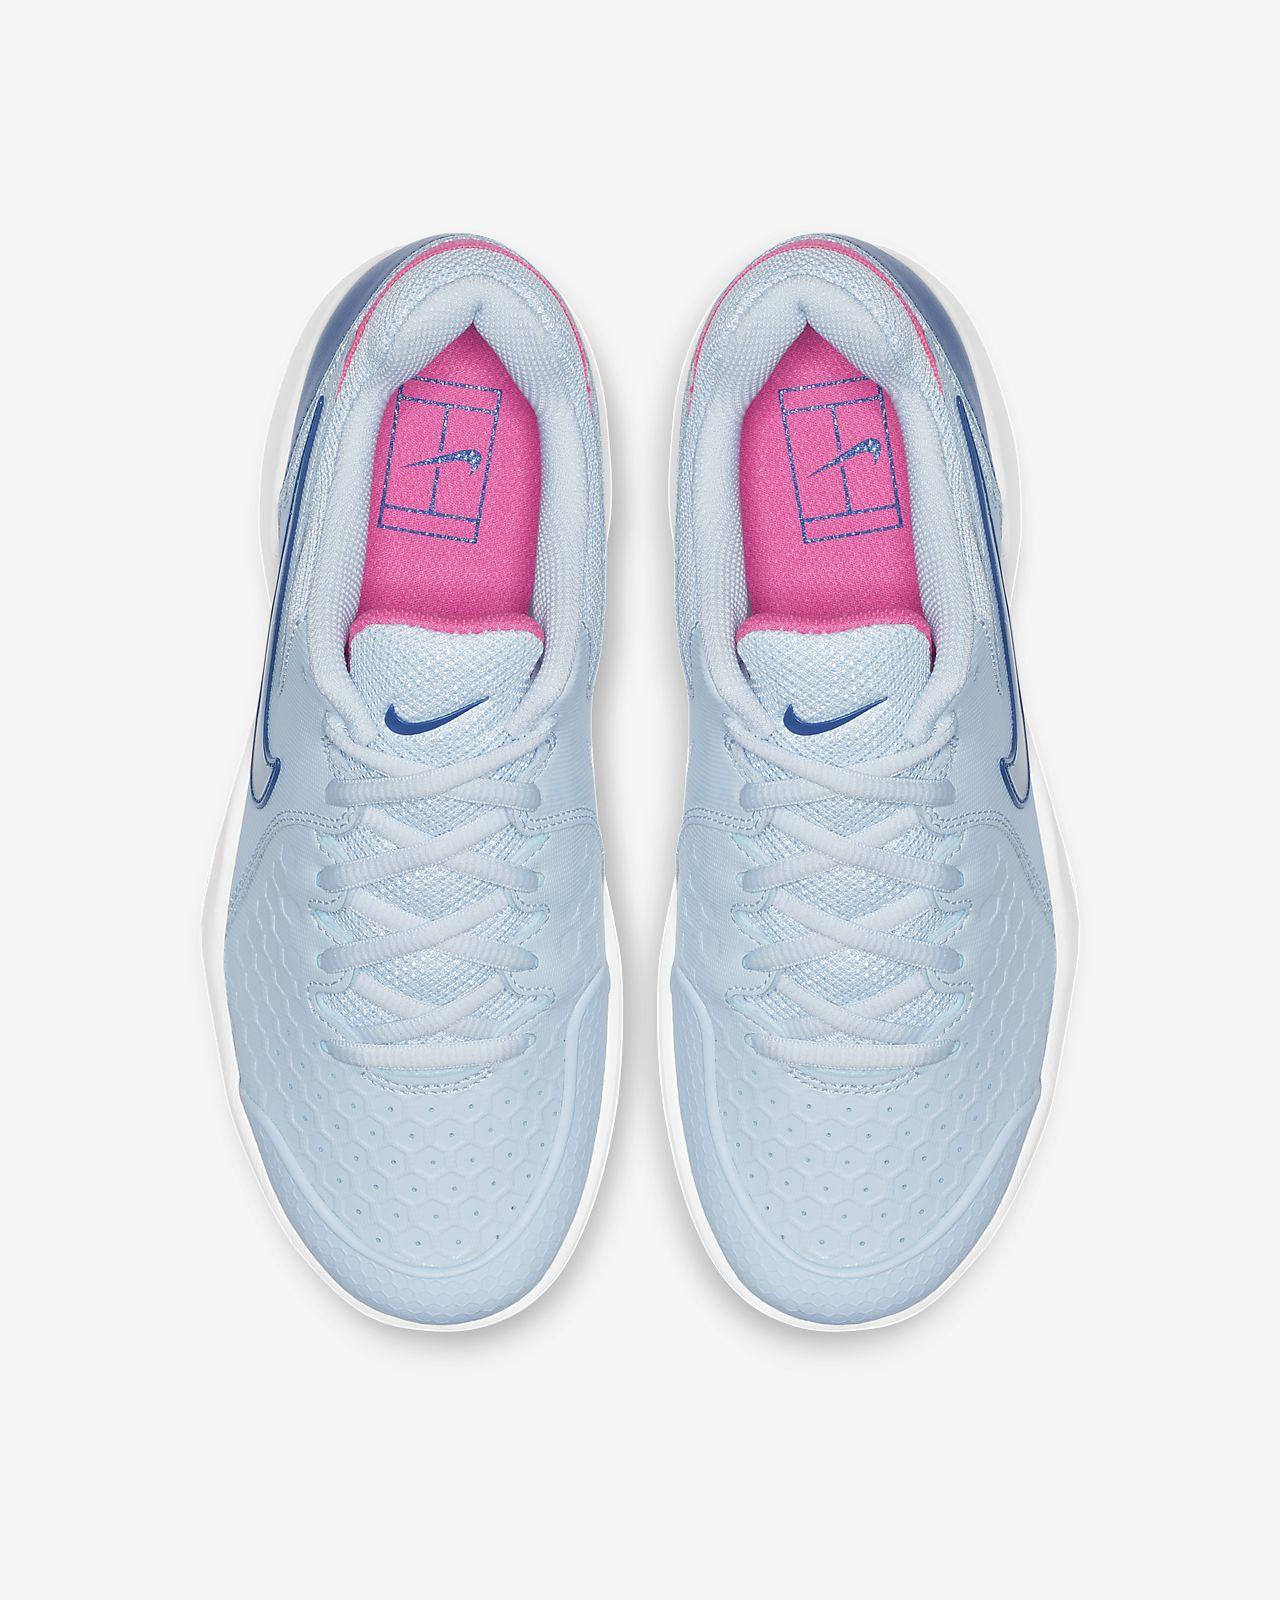 870c45cc85 NikeCourt Air Zoom Resistance Women's Hard Court Tennis Shoe. Nike.com